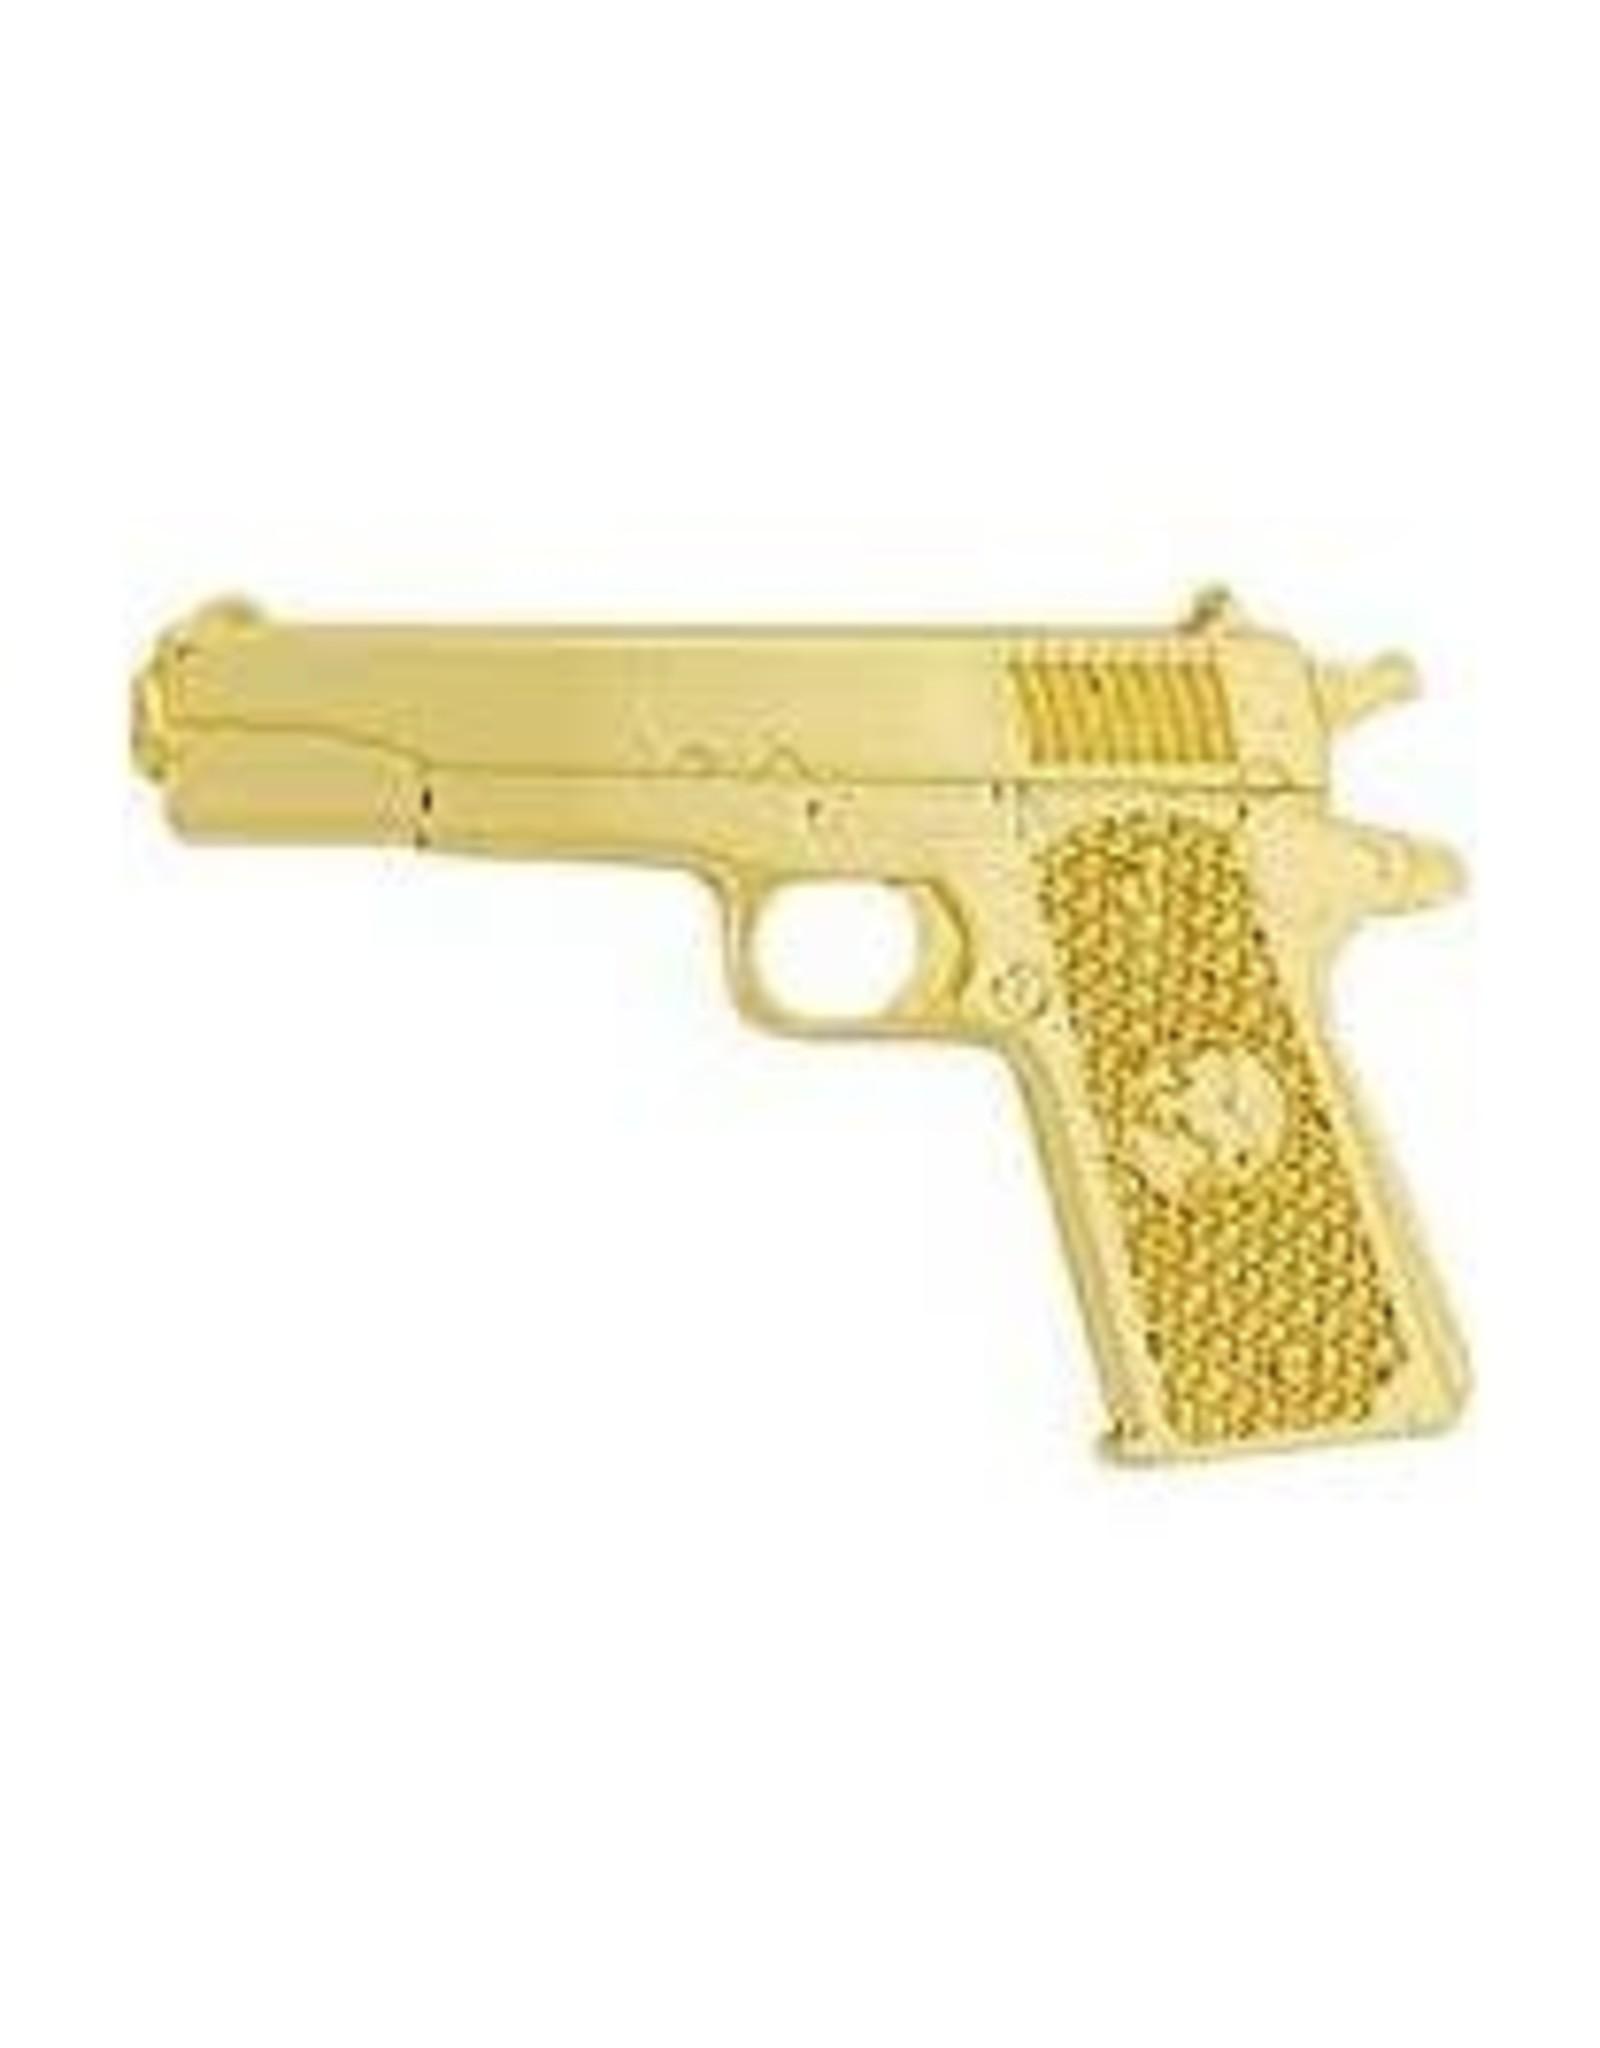 Pin - 45Cal Pistol Model 1911 Gold